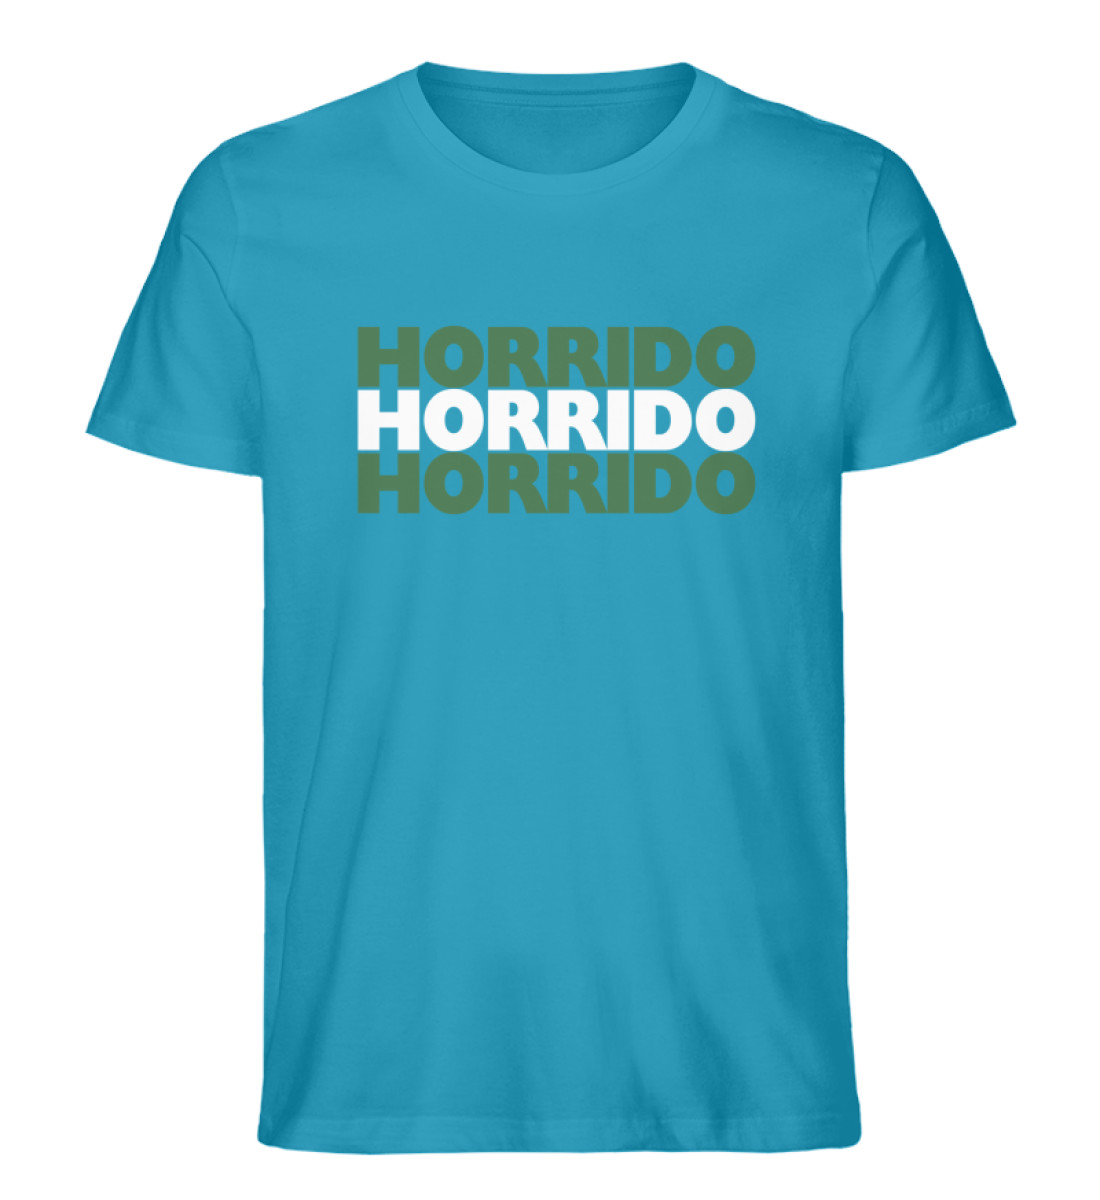 Horrido - Herren Premium Organic Shirt-6885